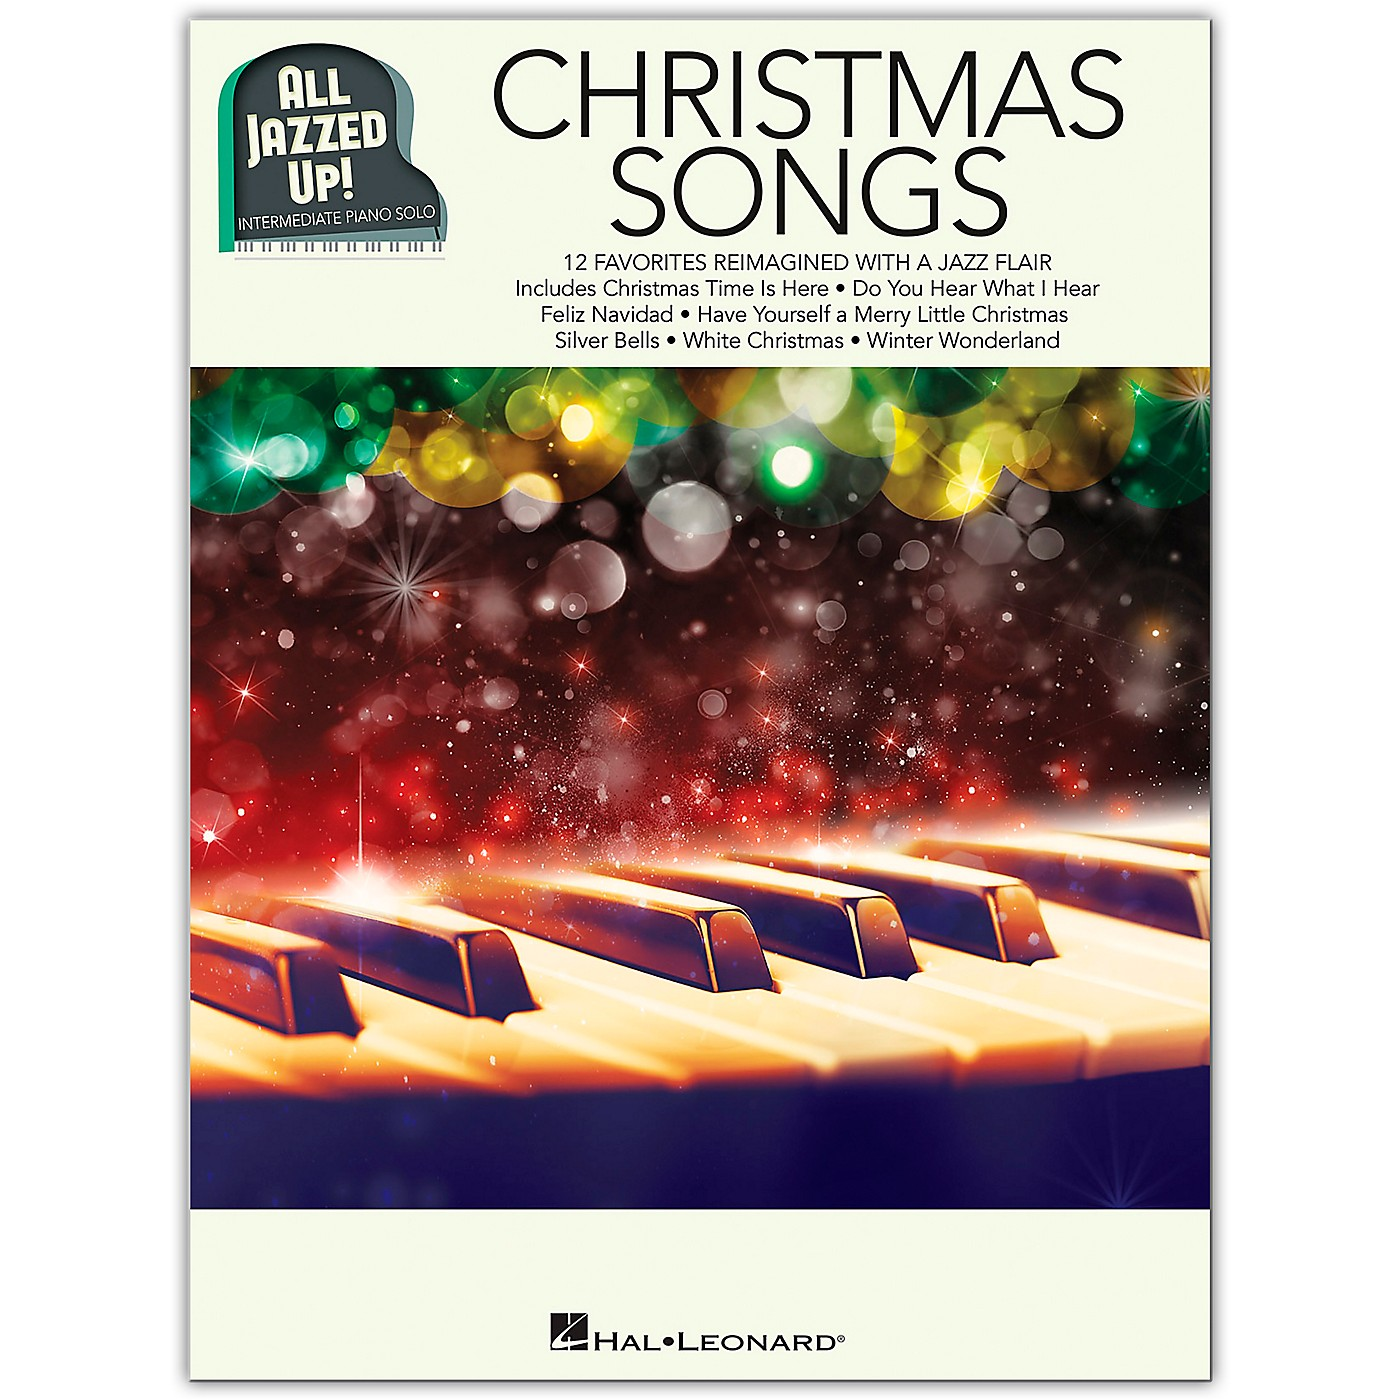 Hal Leonard Christmas Songs - All Jazzed Up!  (Intermediate Piano Solo) thumbnail